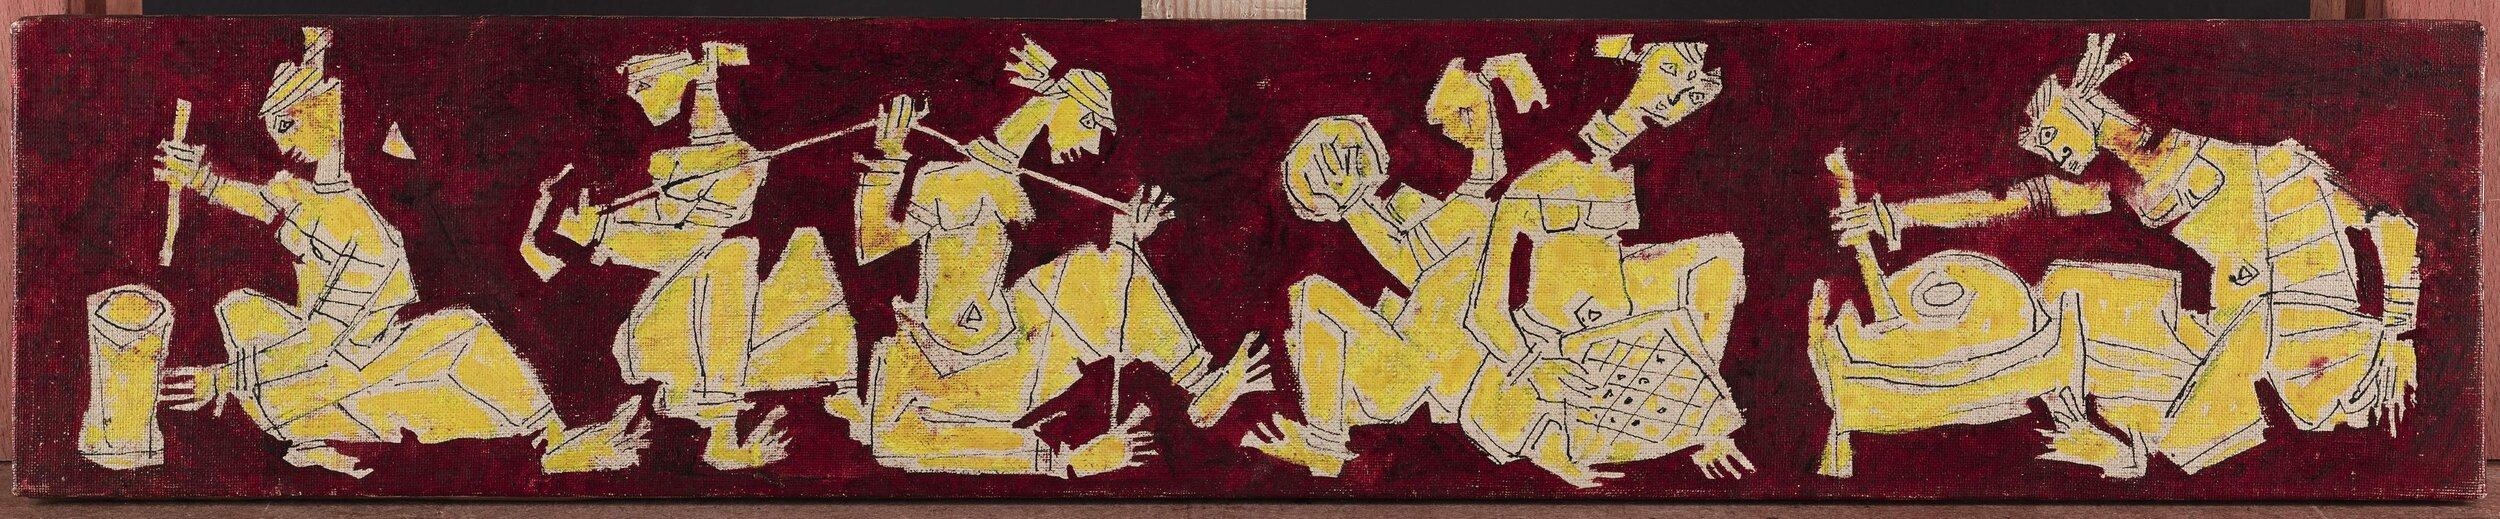 M.F. Husain. Villagers, 1955. .Oil on canvas. H. 5 x W. 25 1/2 in. (12.7 x 64.8 cm). Ashish and Reshma Jain, New Delhi. Image courtesy of Grosvenor Gallery